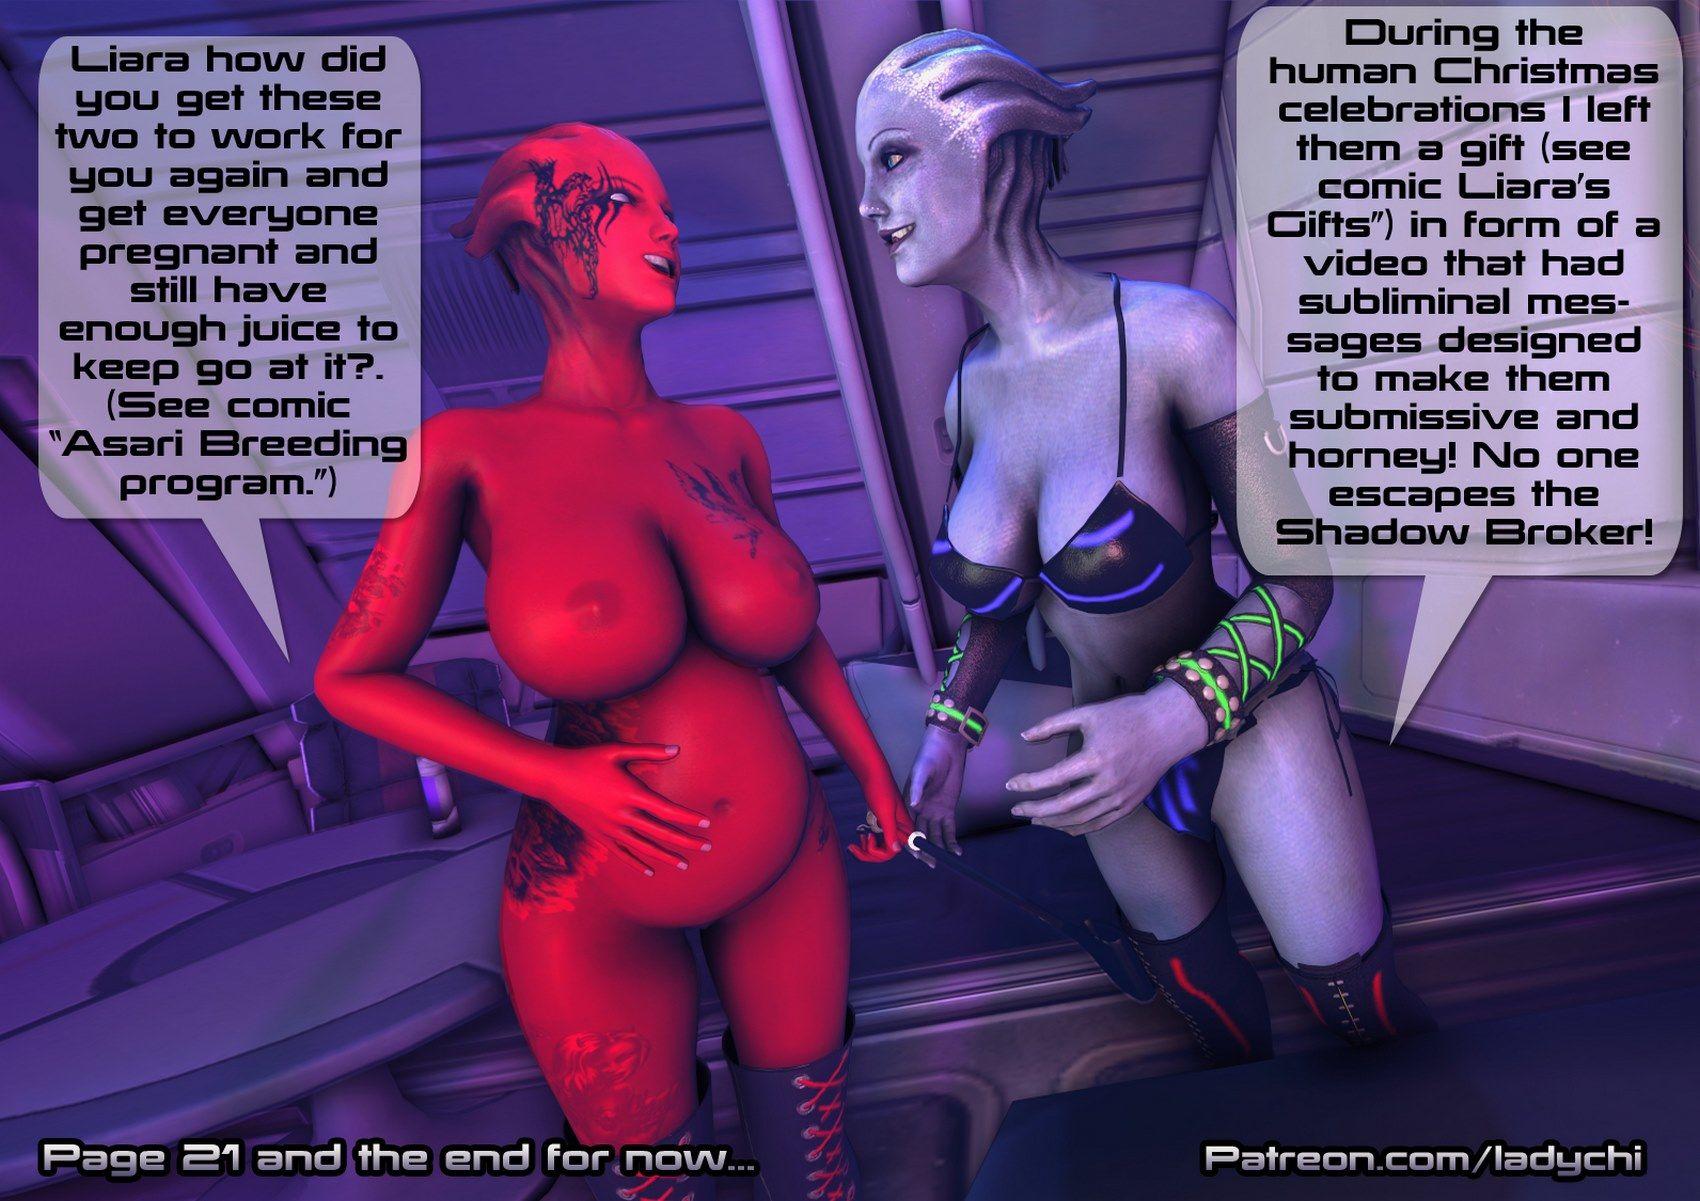 Jacks_Dream_Ladychi_(Mass_Effect) comix_57912.jpg